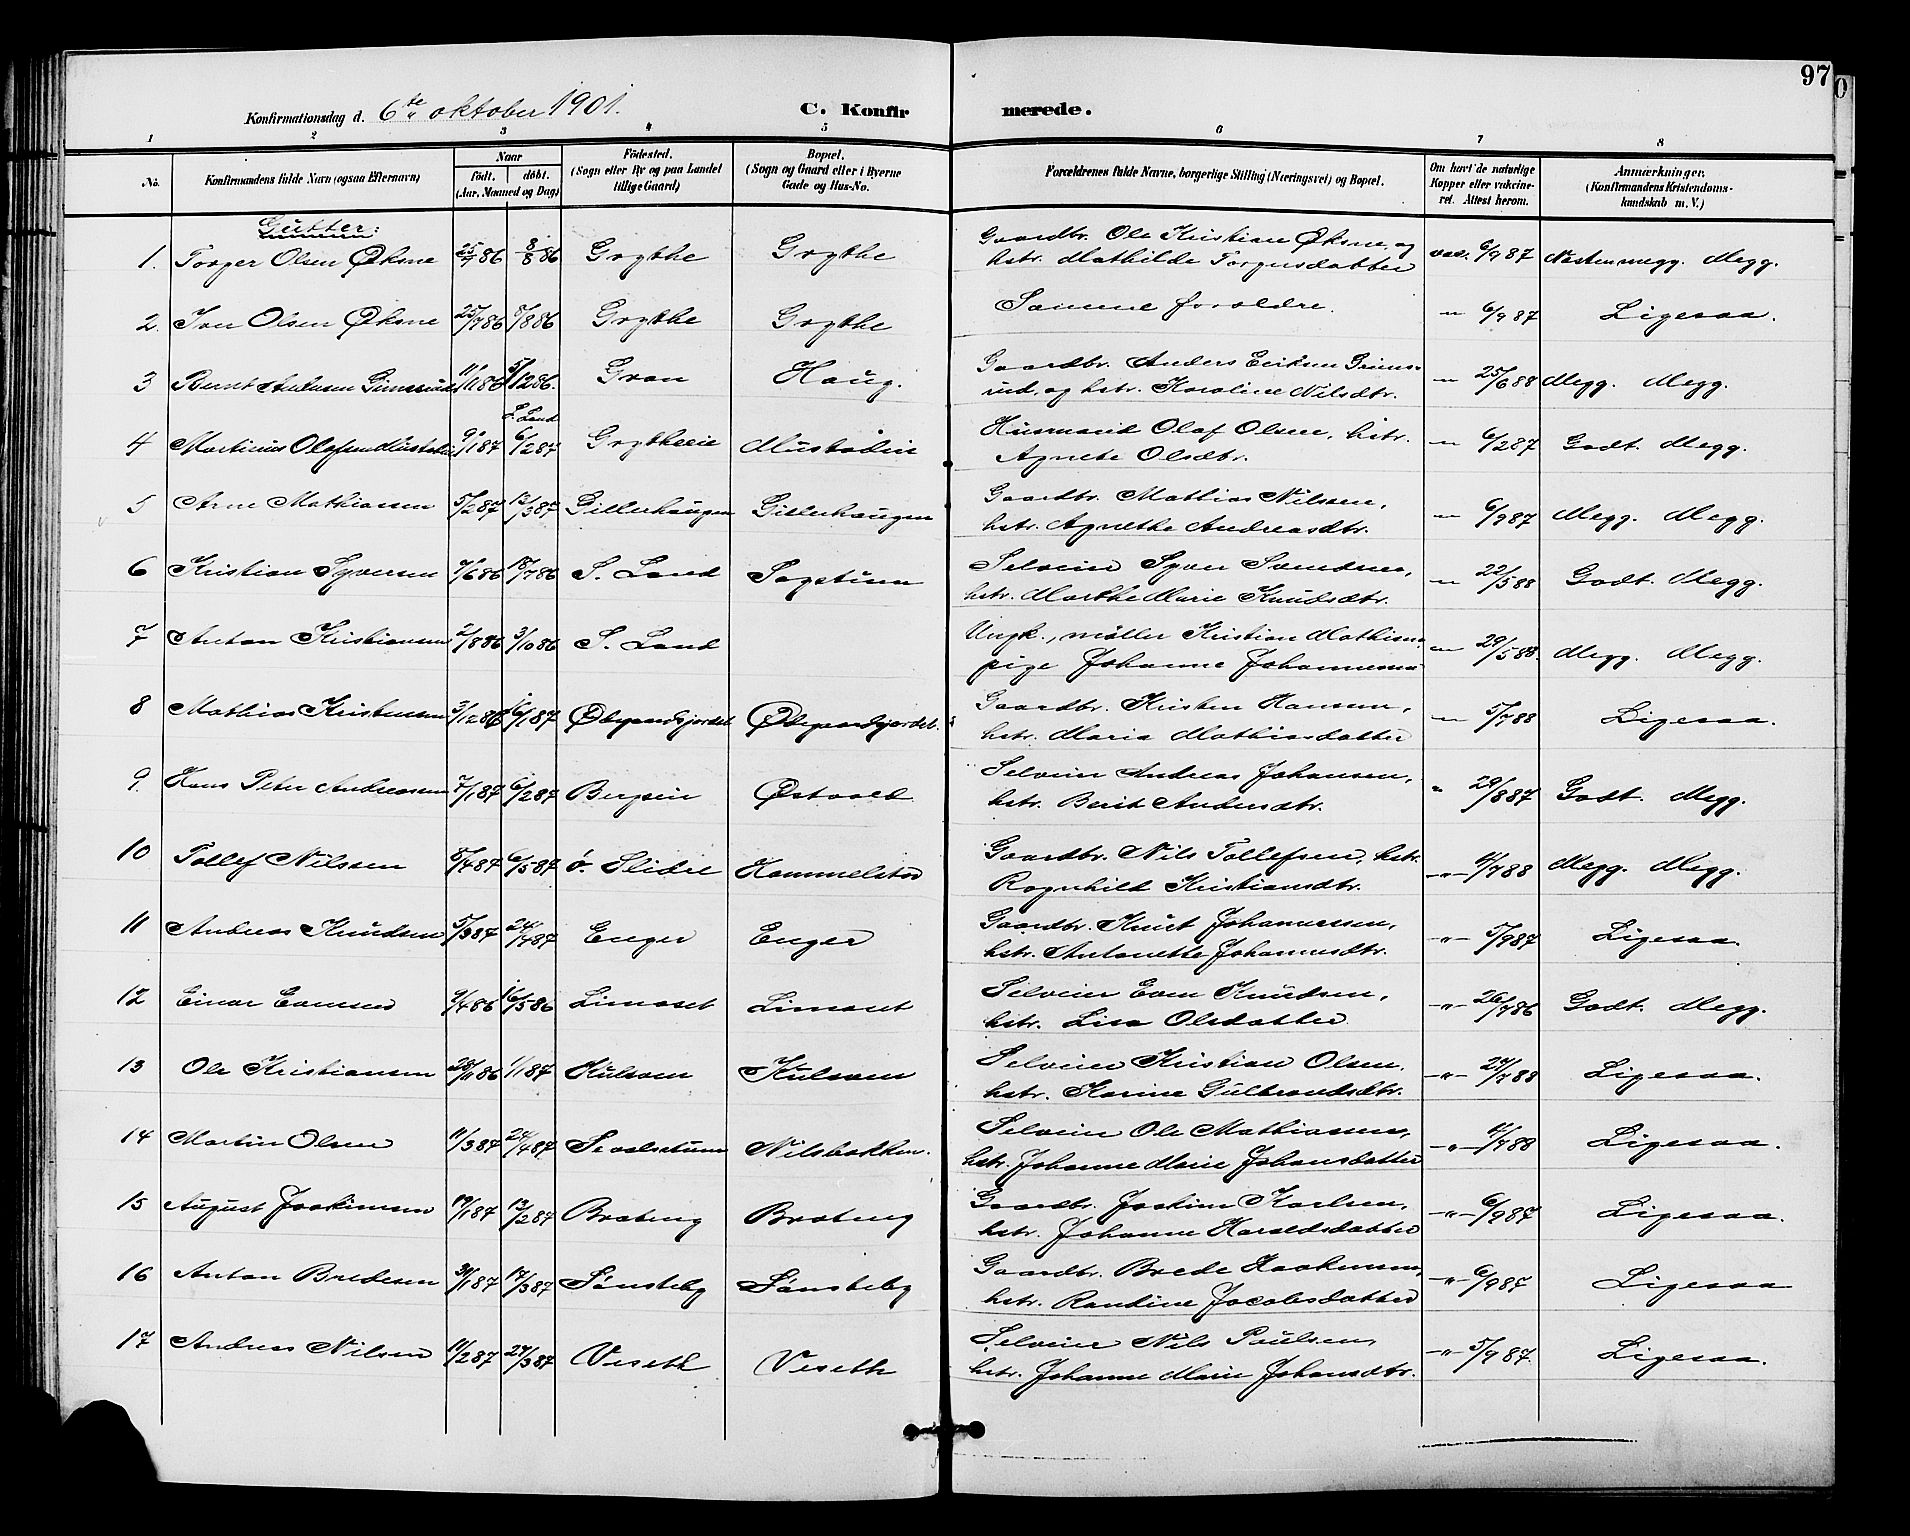 SAH, Vardal prestekontor, H/Ha/Hab/L0011: Klokkerbok nr. 11, 1899-1913, s. 97